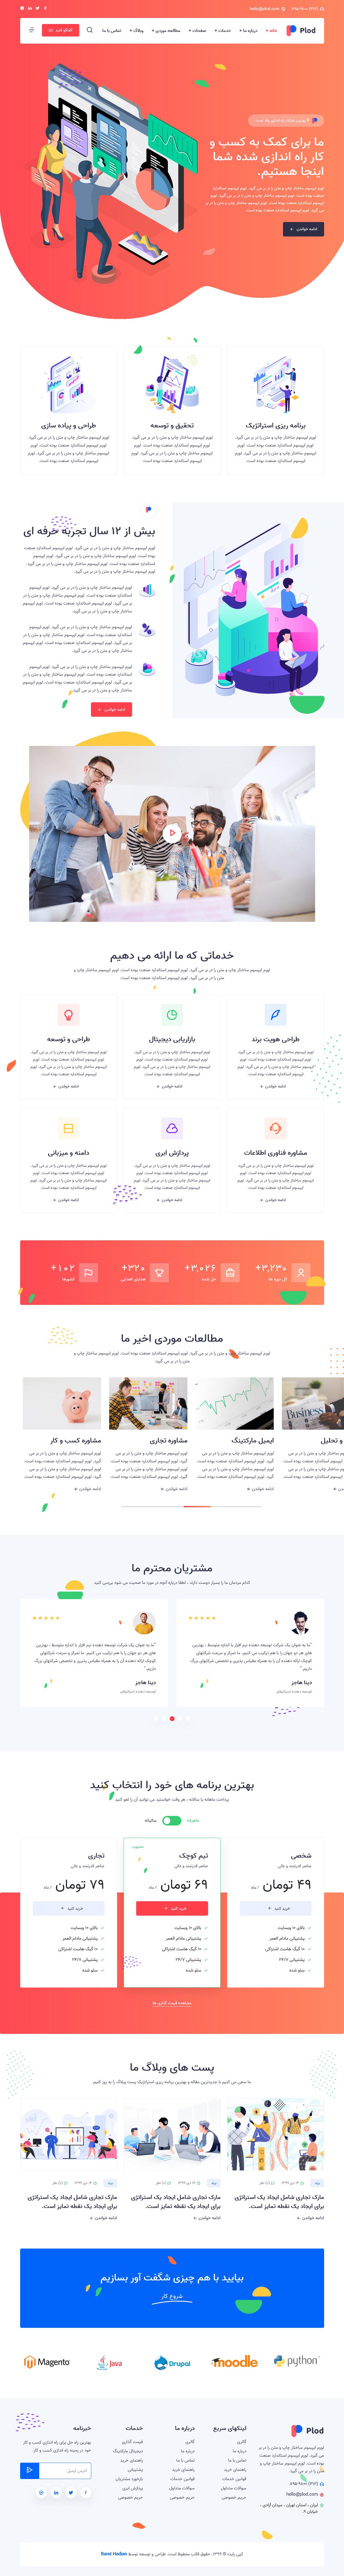 قالب HTML دیجیتال مارکتینگ plod